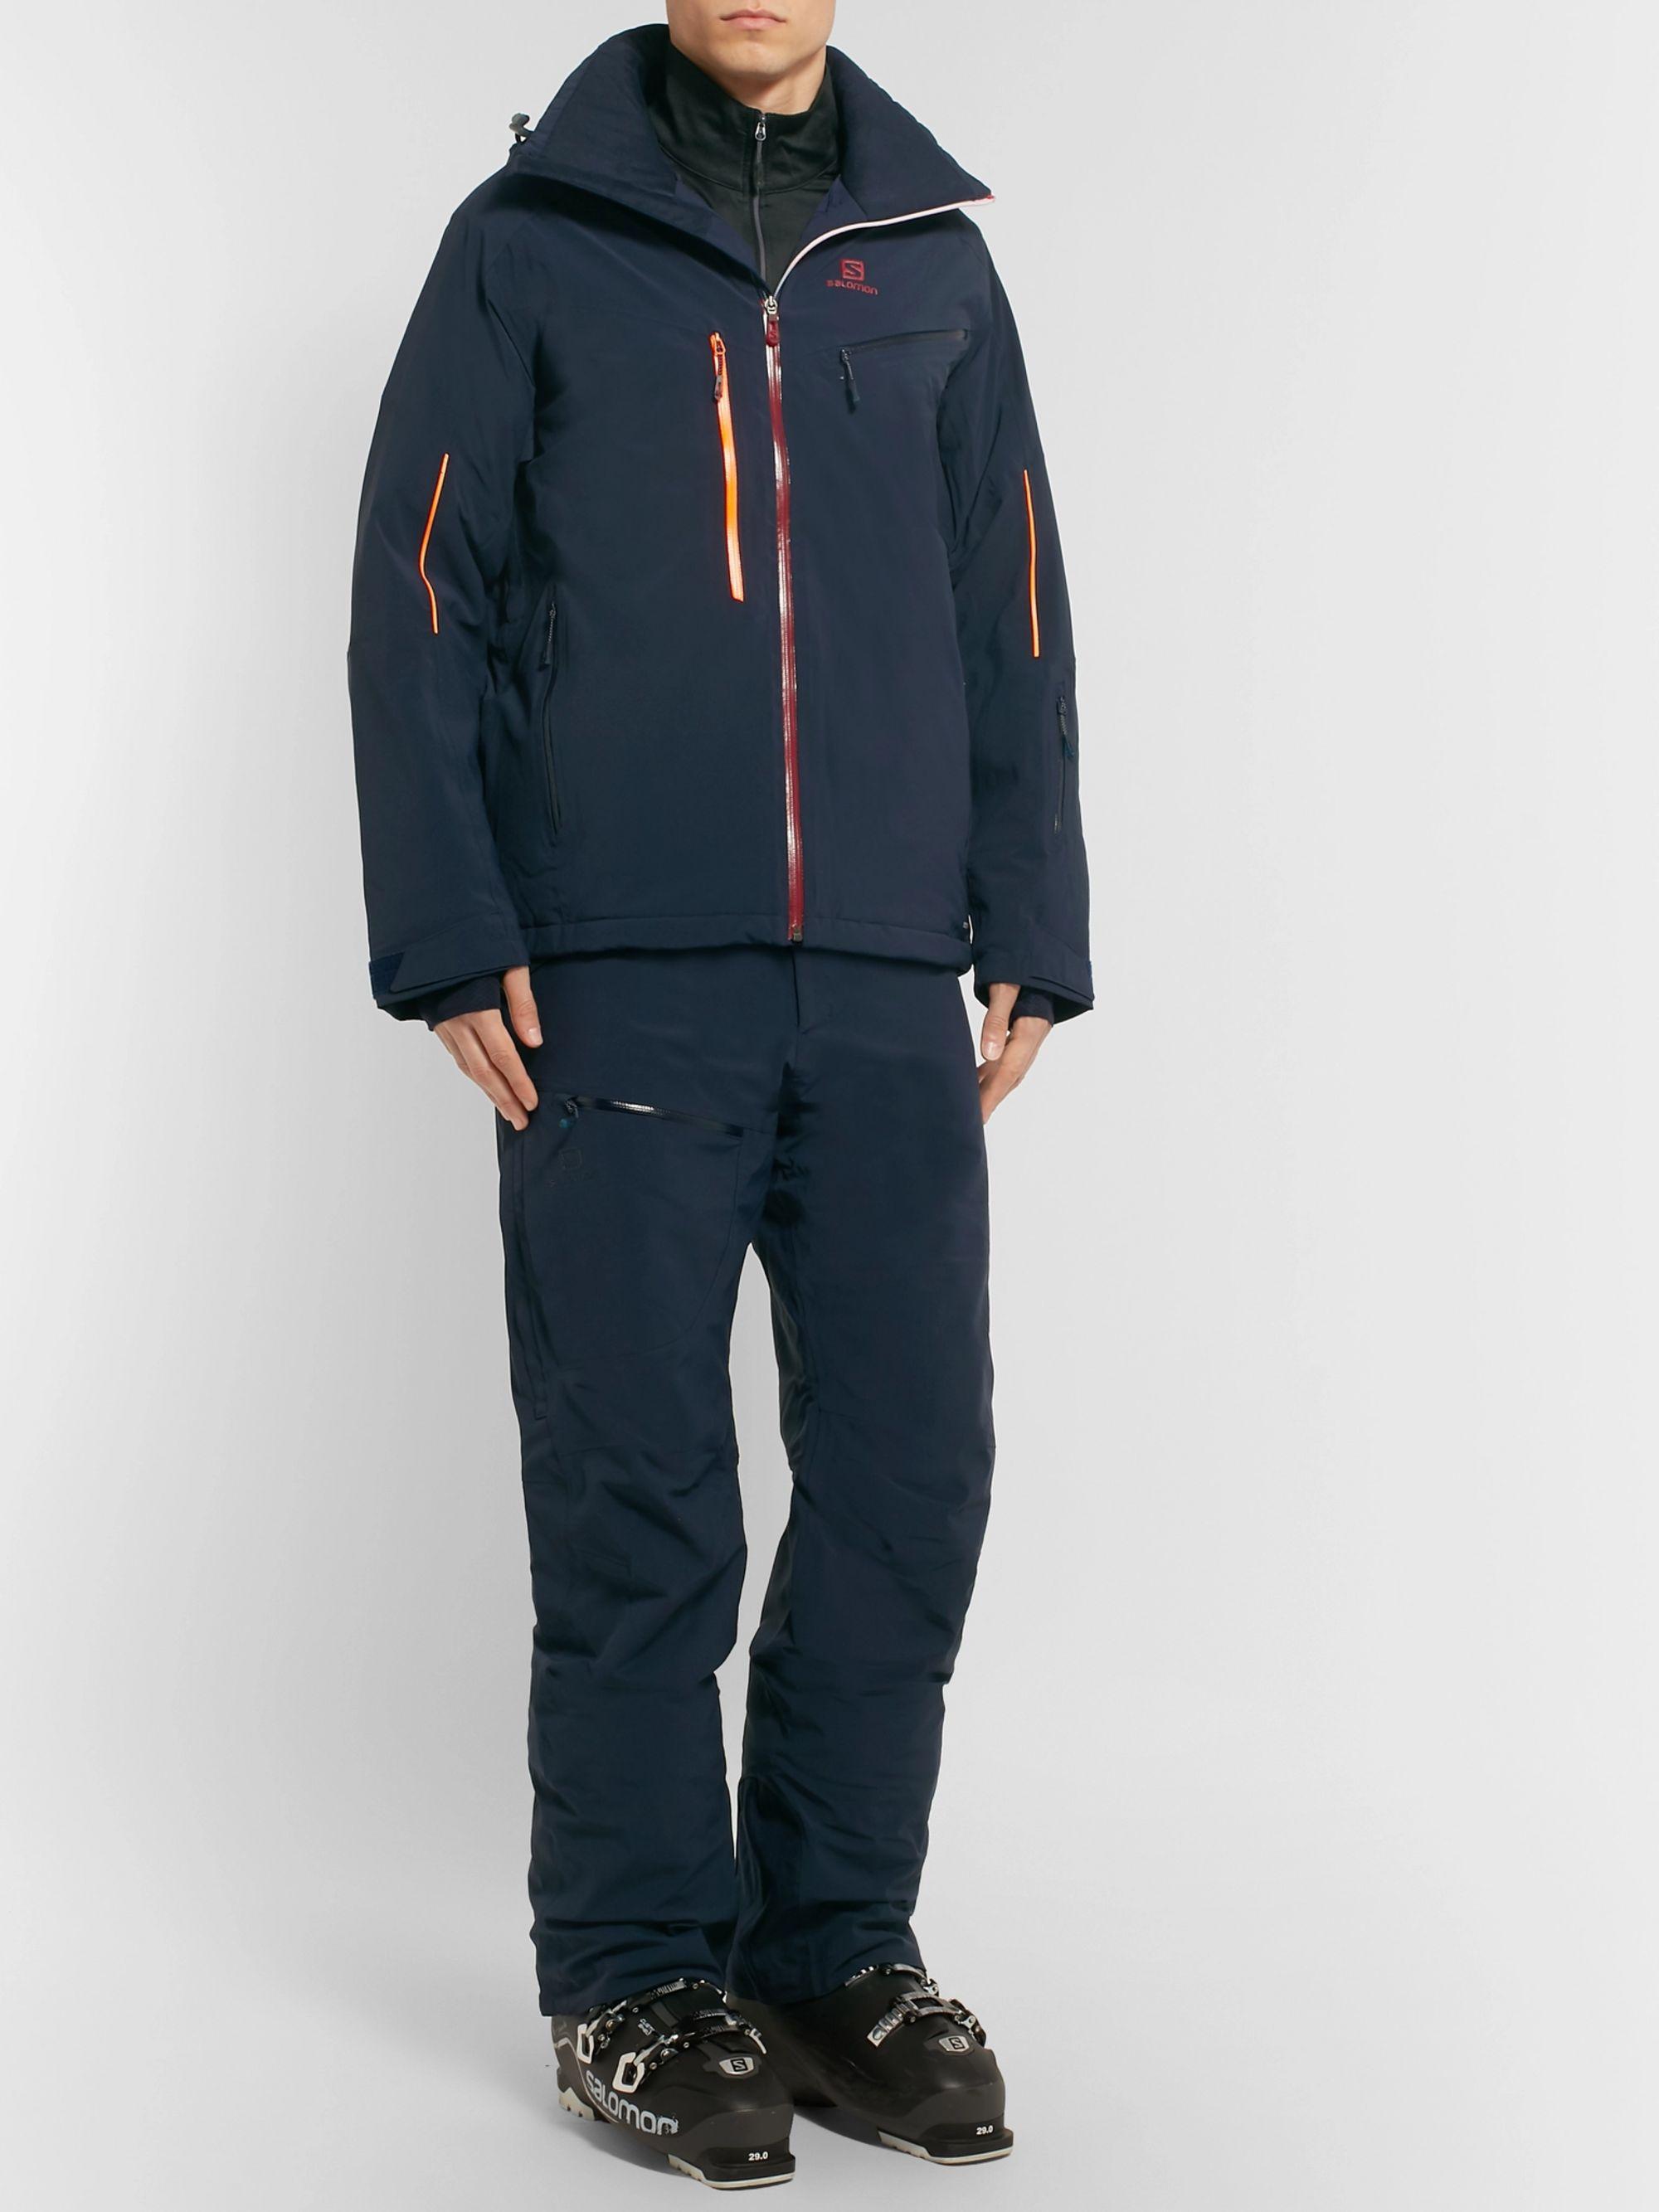 best place online retailer quality Icespeed Ski Jacket